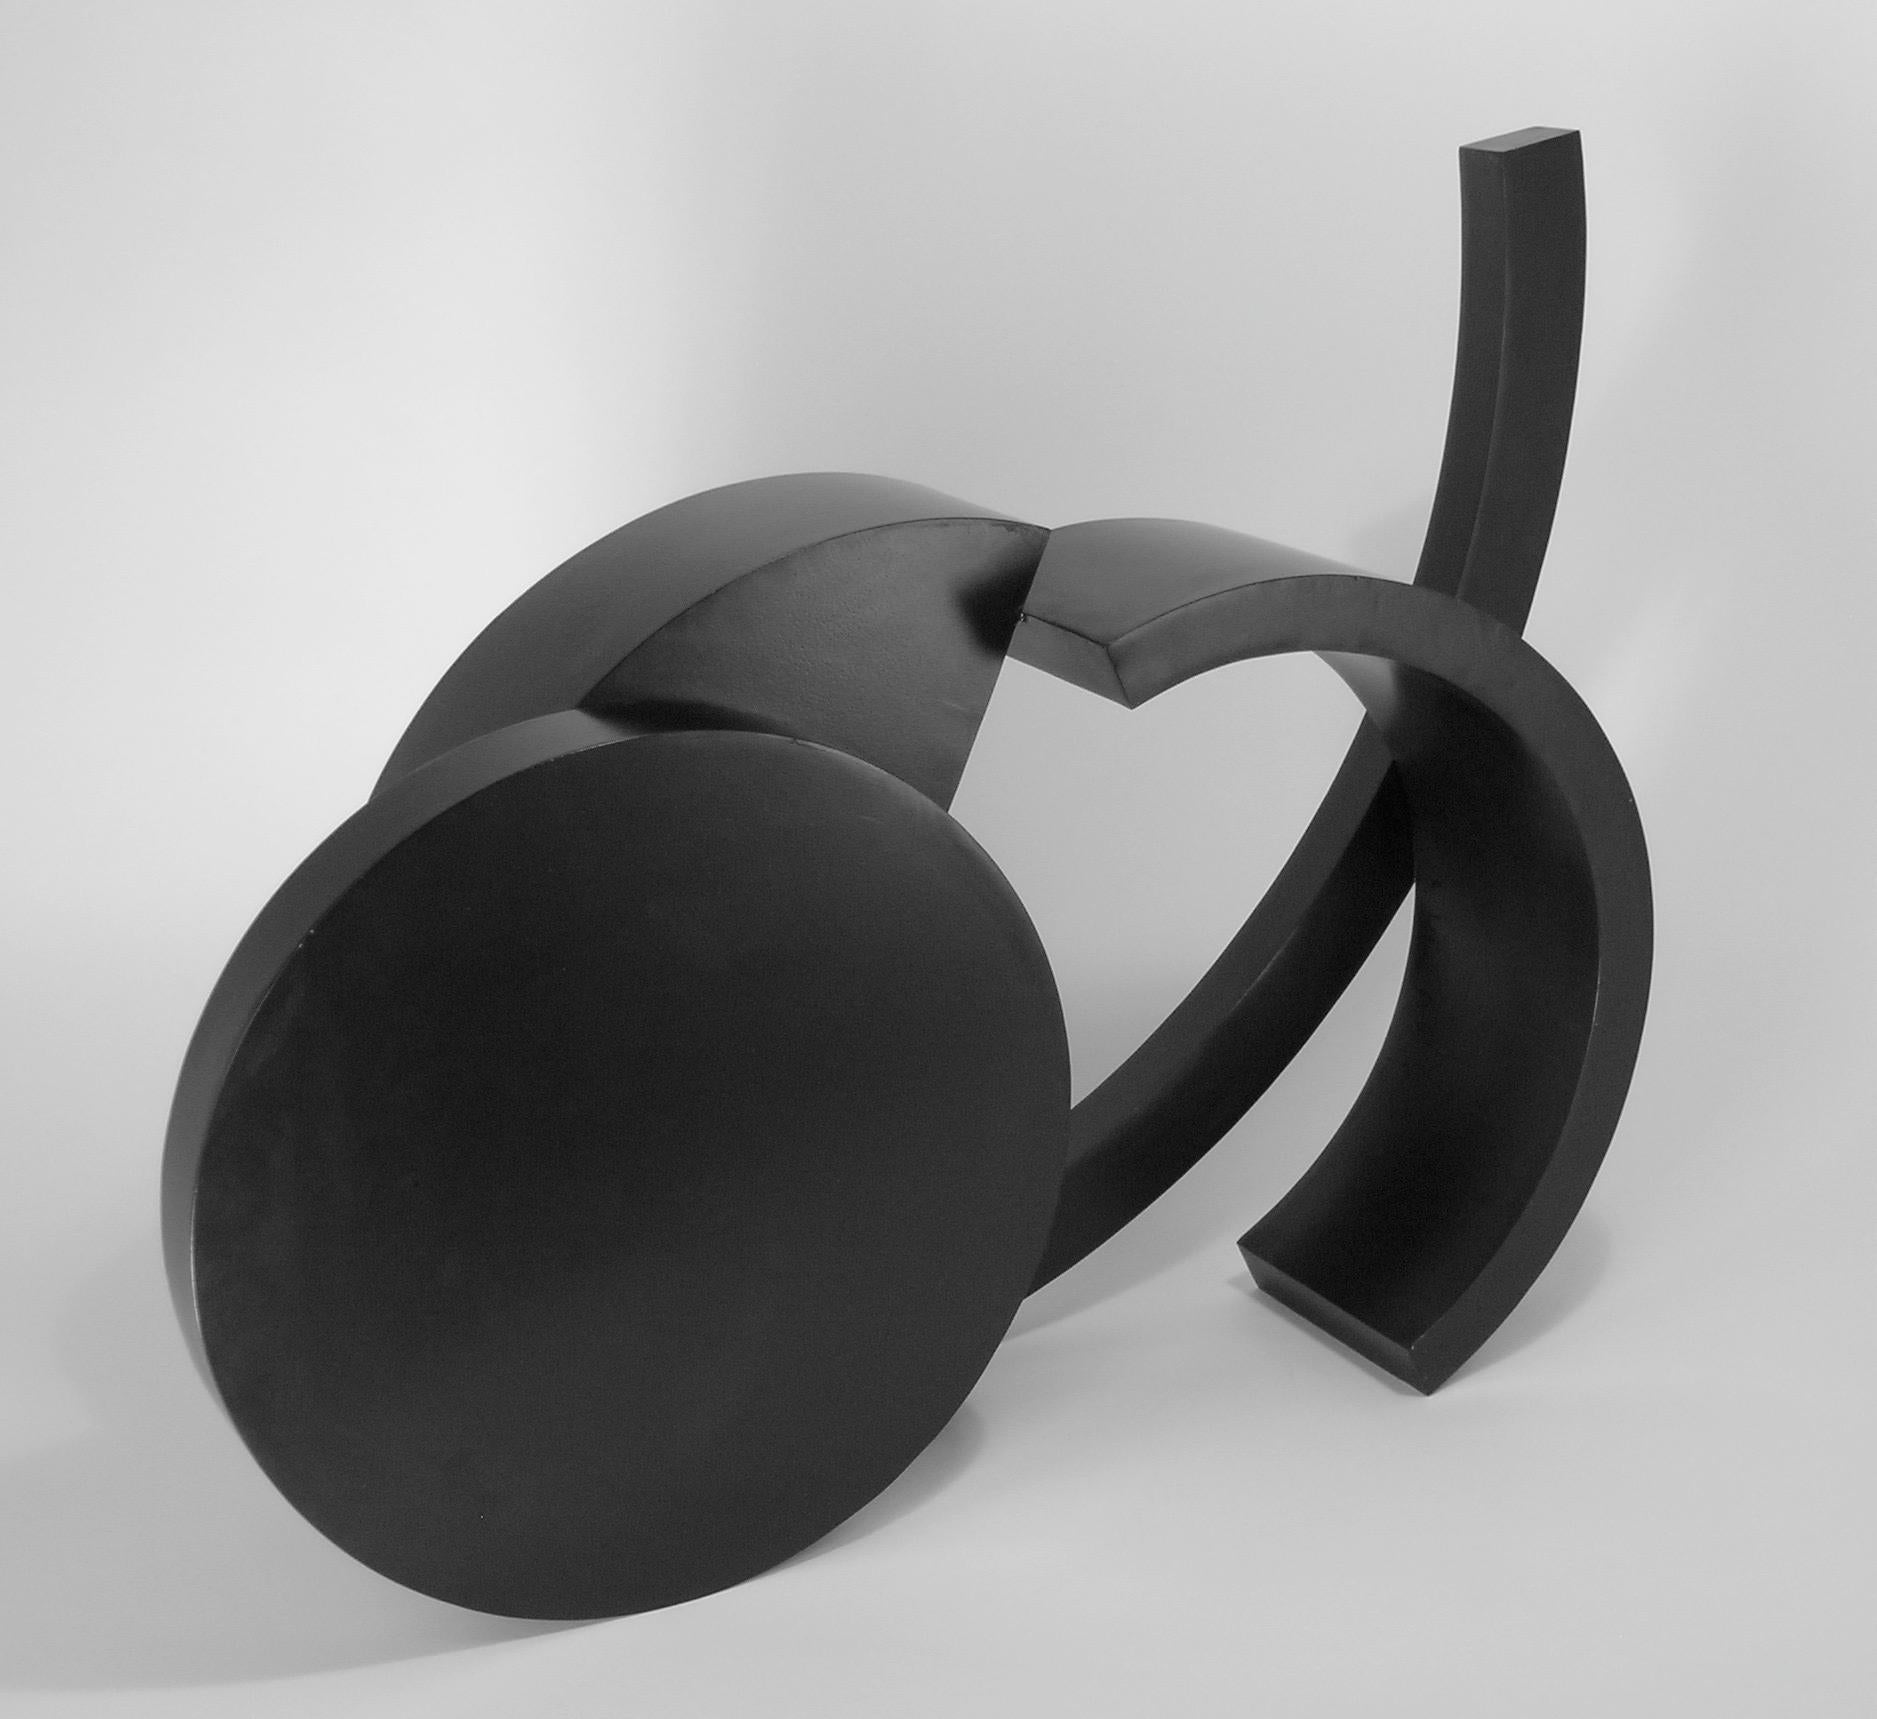 Small Ooidonk, abstract steel sculpture, black patina, geometric, indoor,outdoor